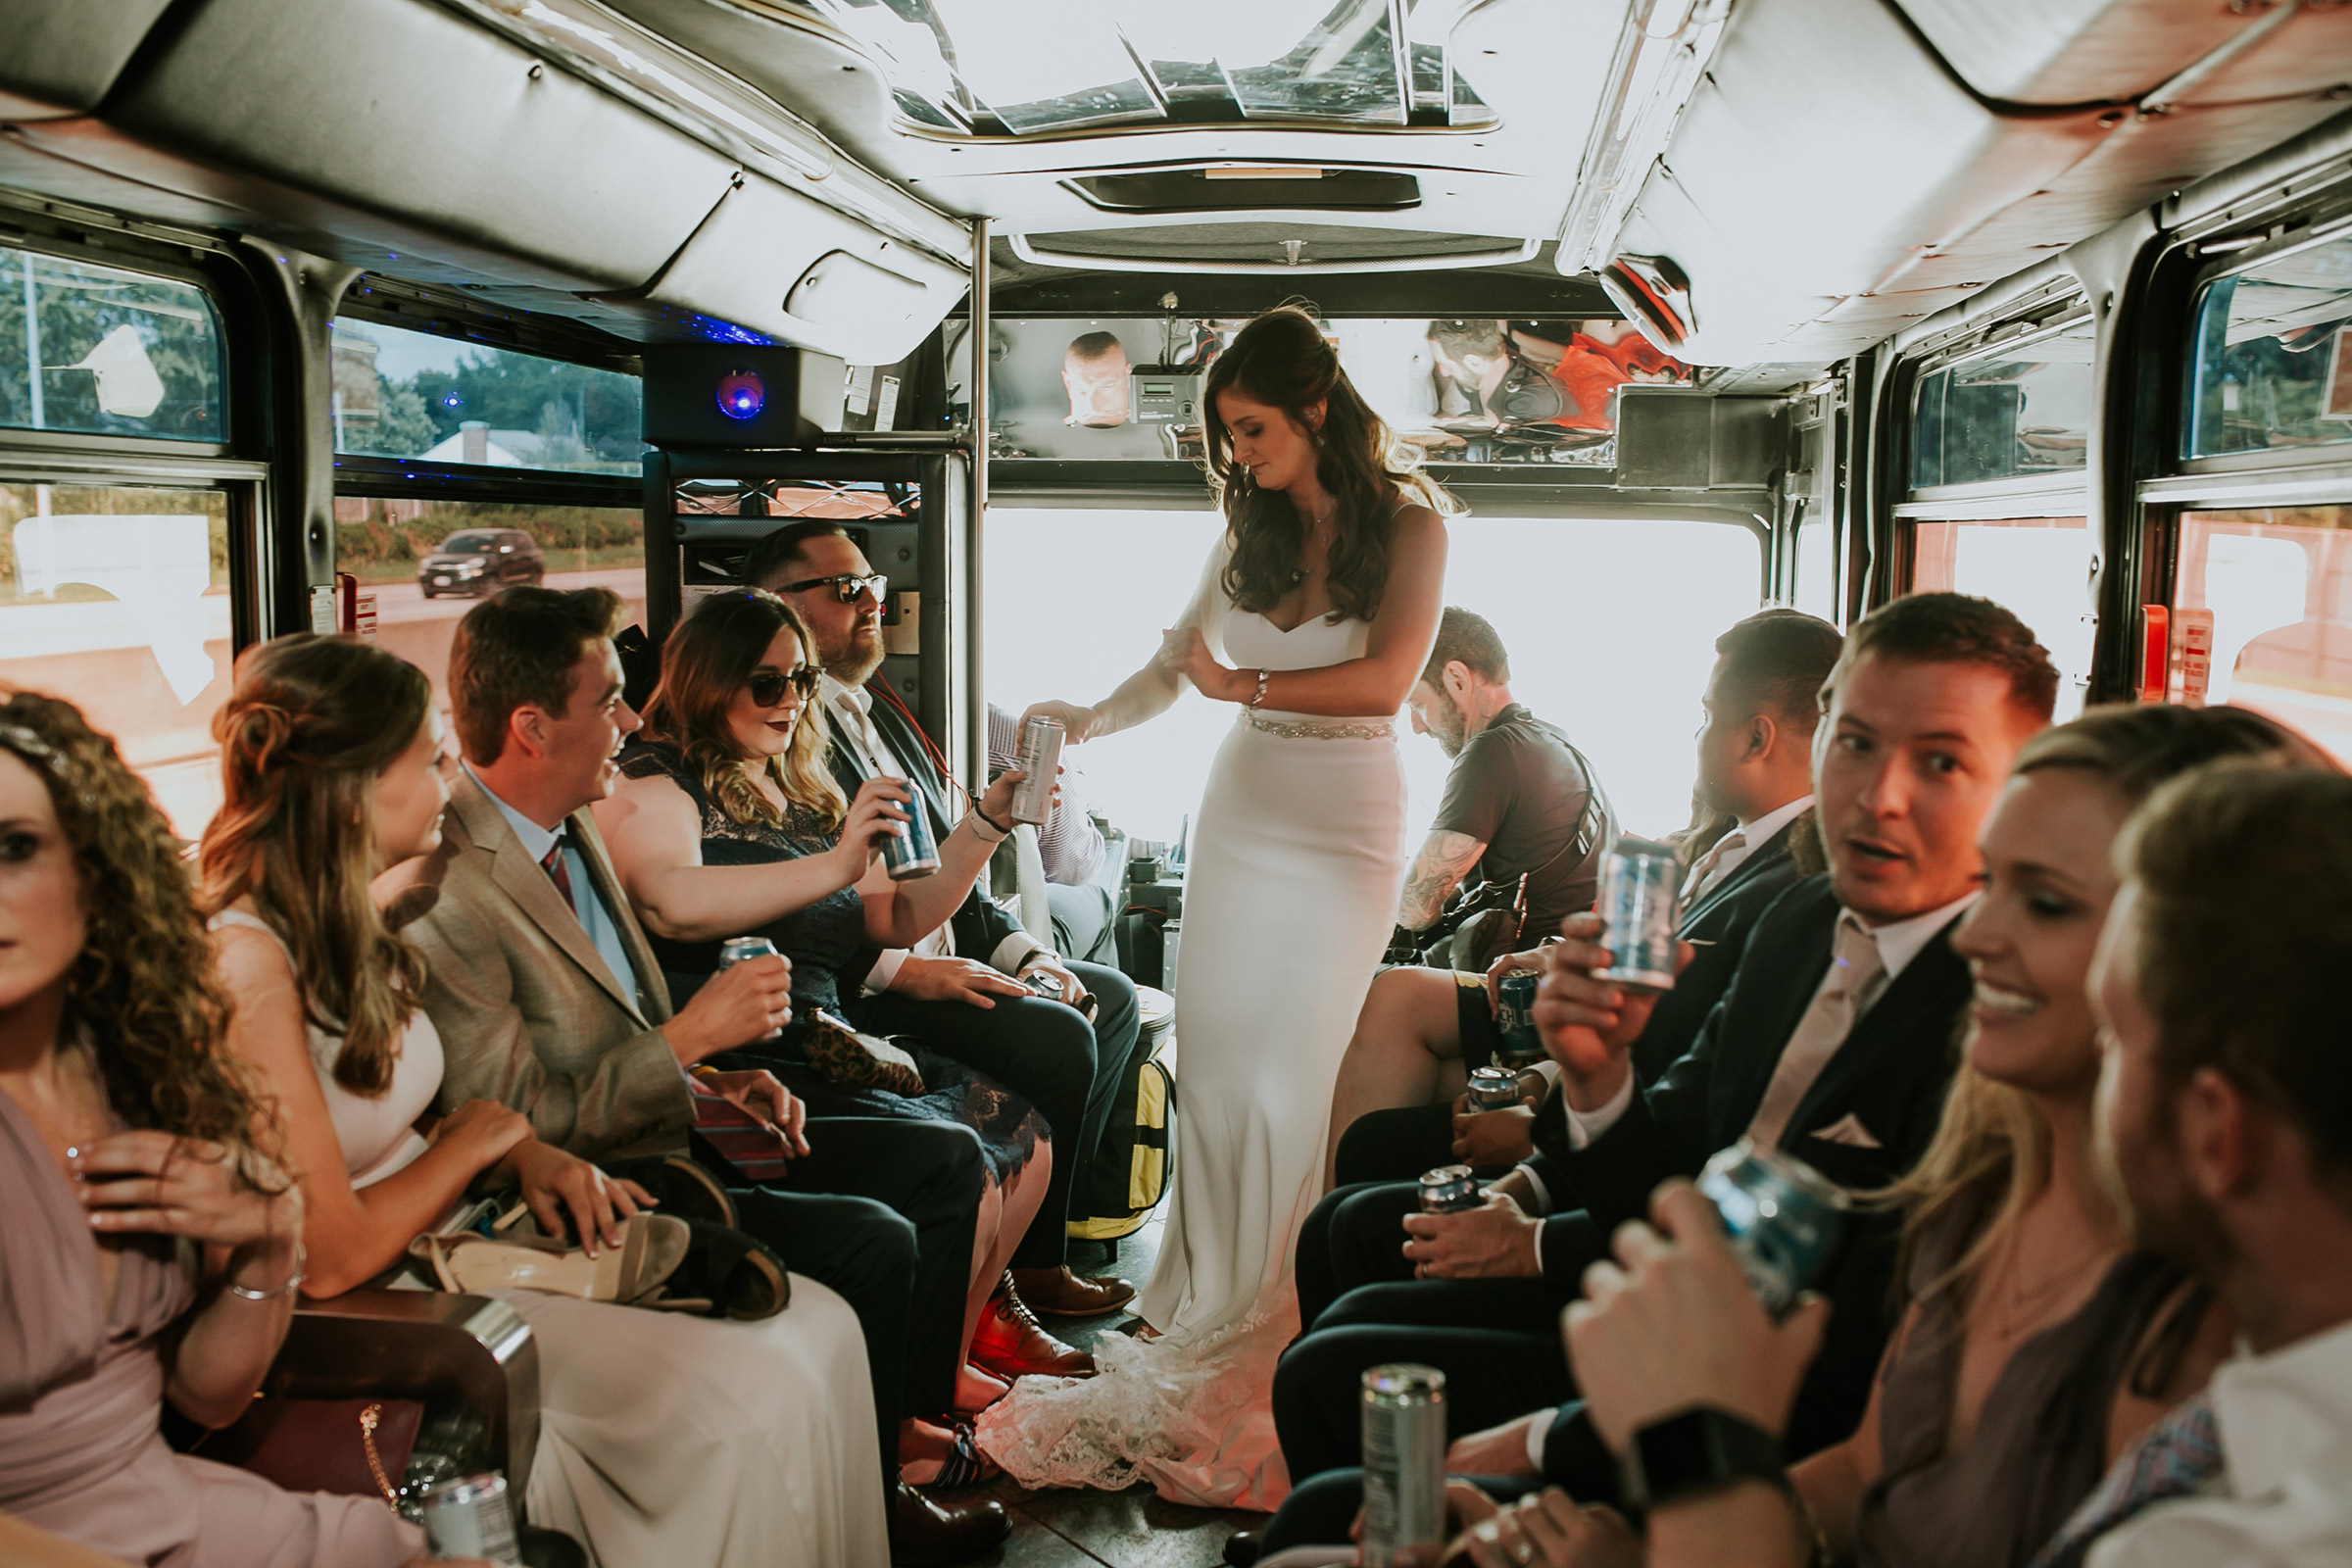 mr-mrs-hull-bride-dancing-bus-desmoines-iowa-raelyn-ramey-photography-386.jpg